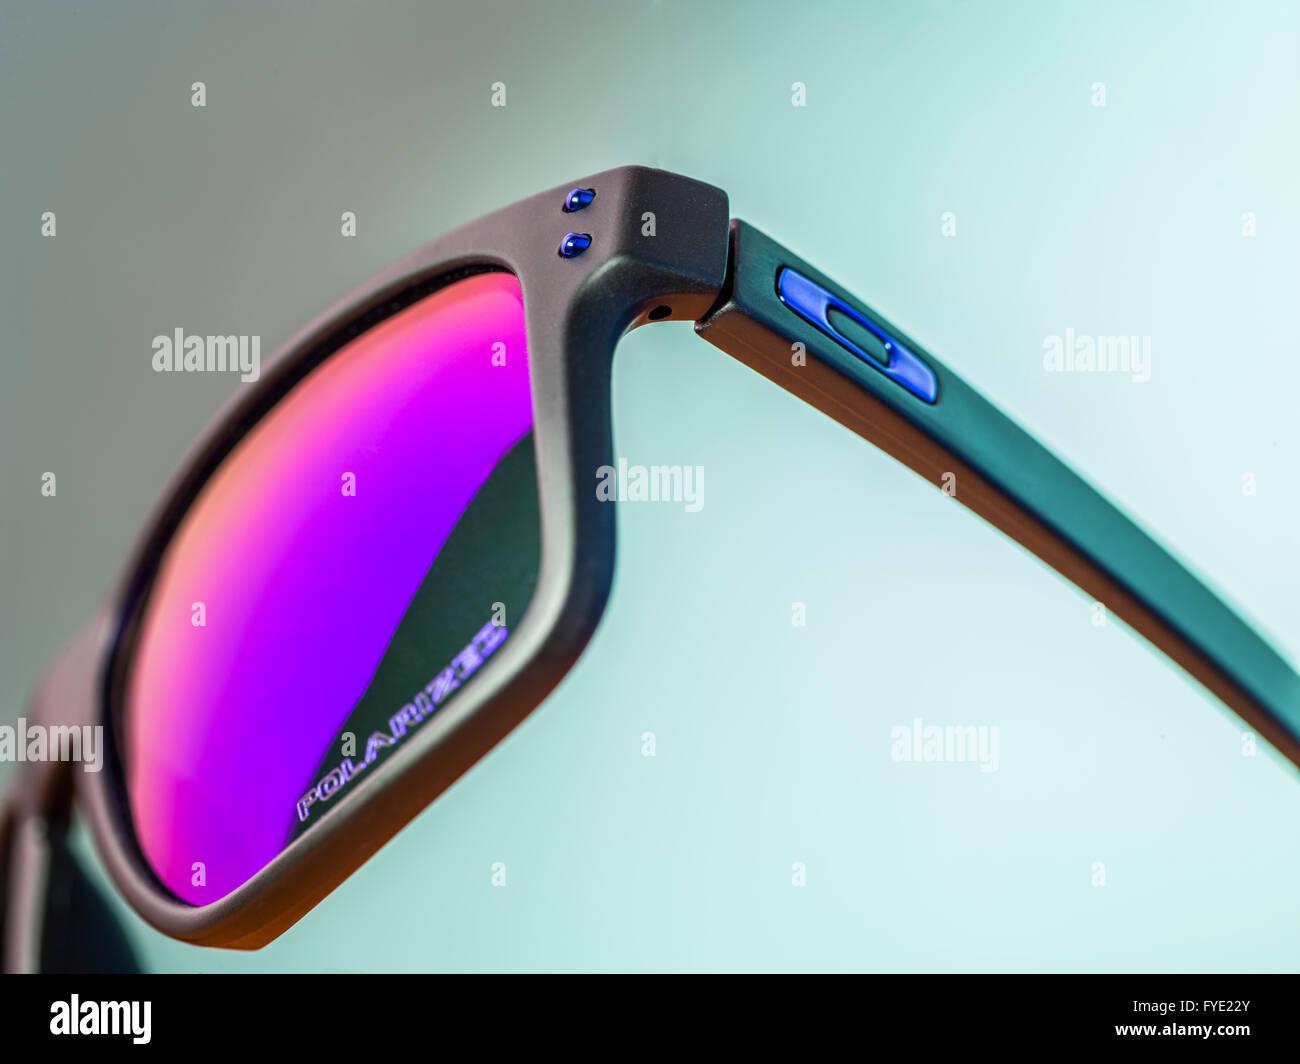 Nett Oakley Quadrat Draht 3 0 Ideen - Elektrische Schaltplan-Ideen ...